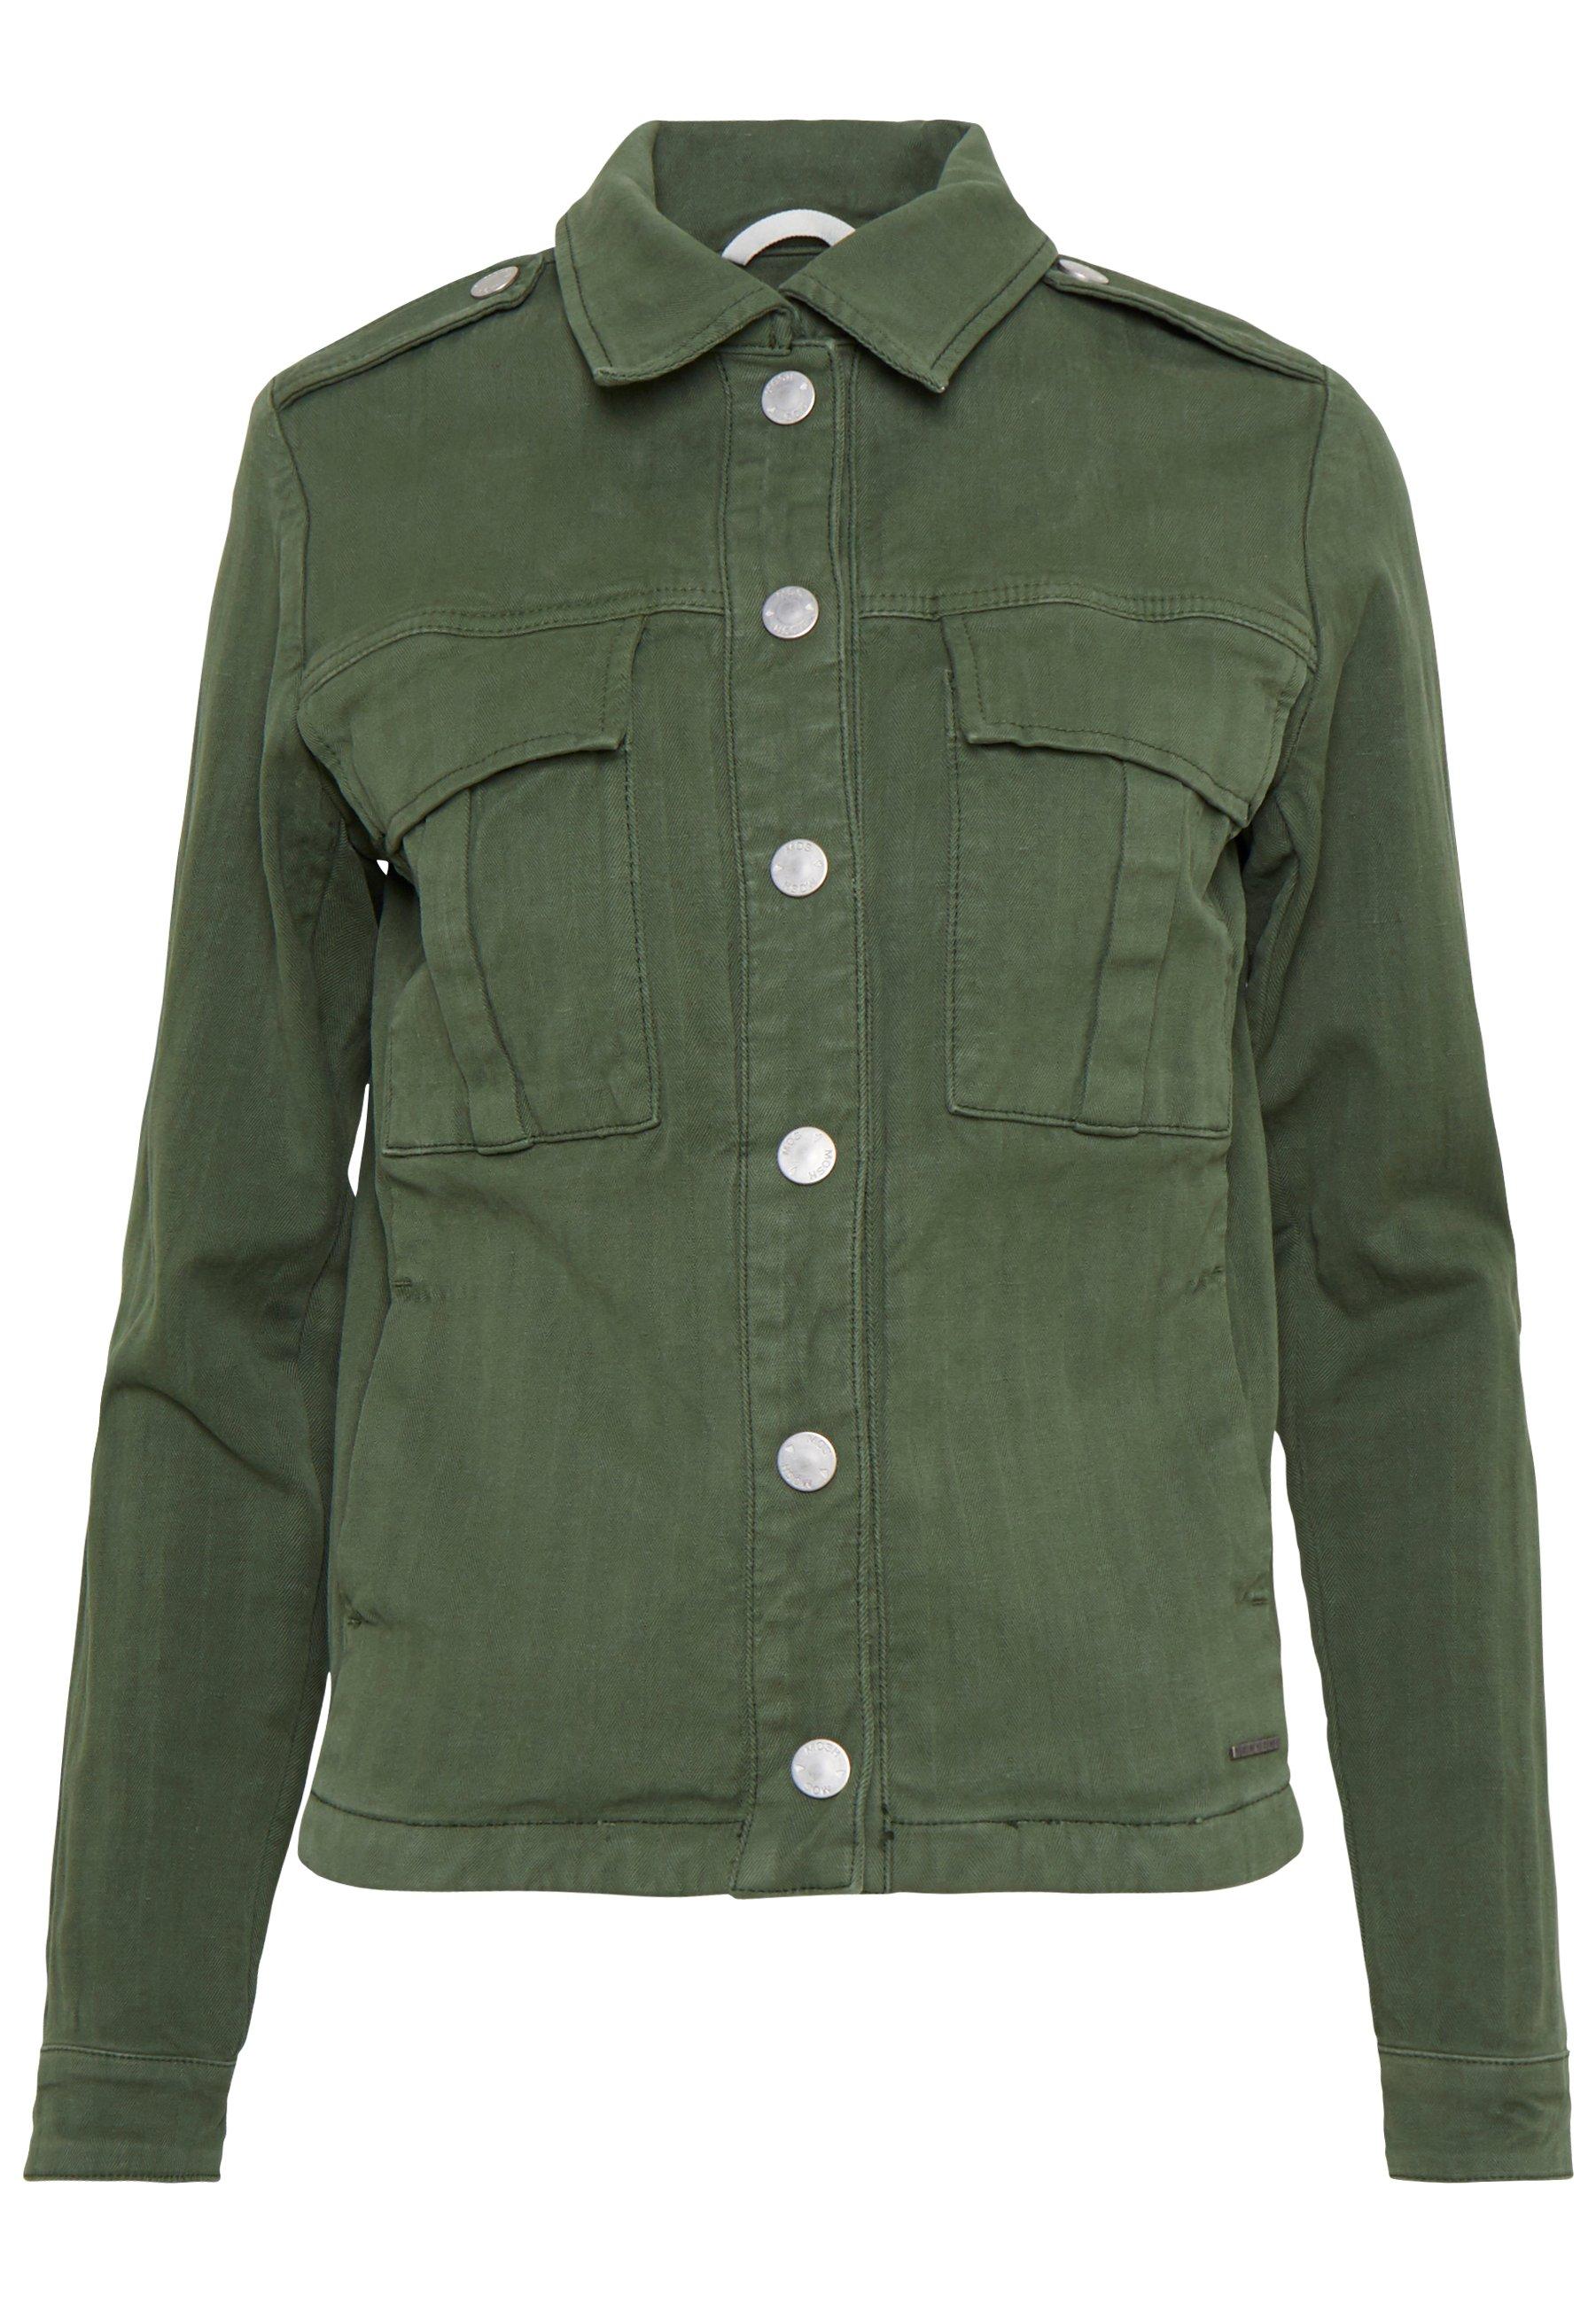 Mos Mosh Blair Herringbone Jacket - Summer Union Green